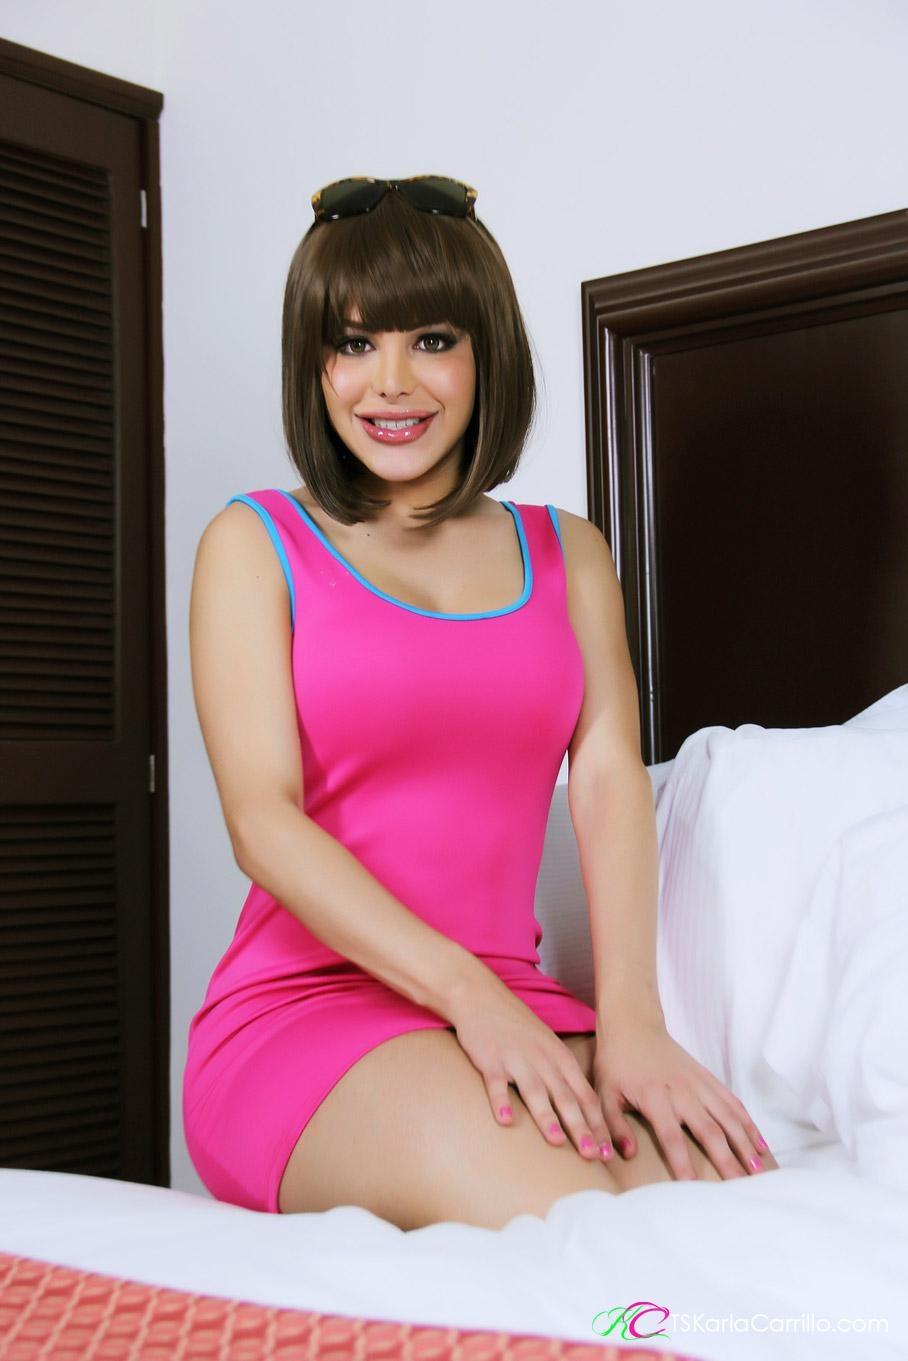 Petite shemale pornstar Karla Carrillo baring large tits before jerking off massive cock